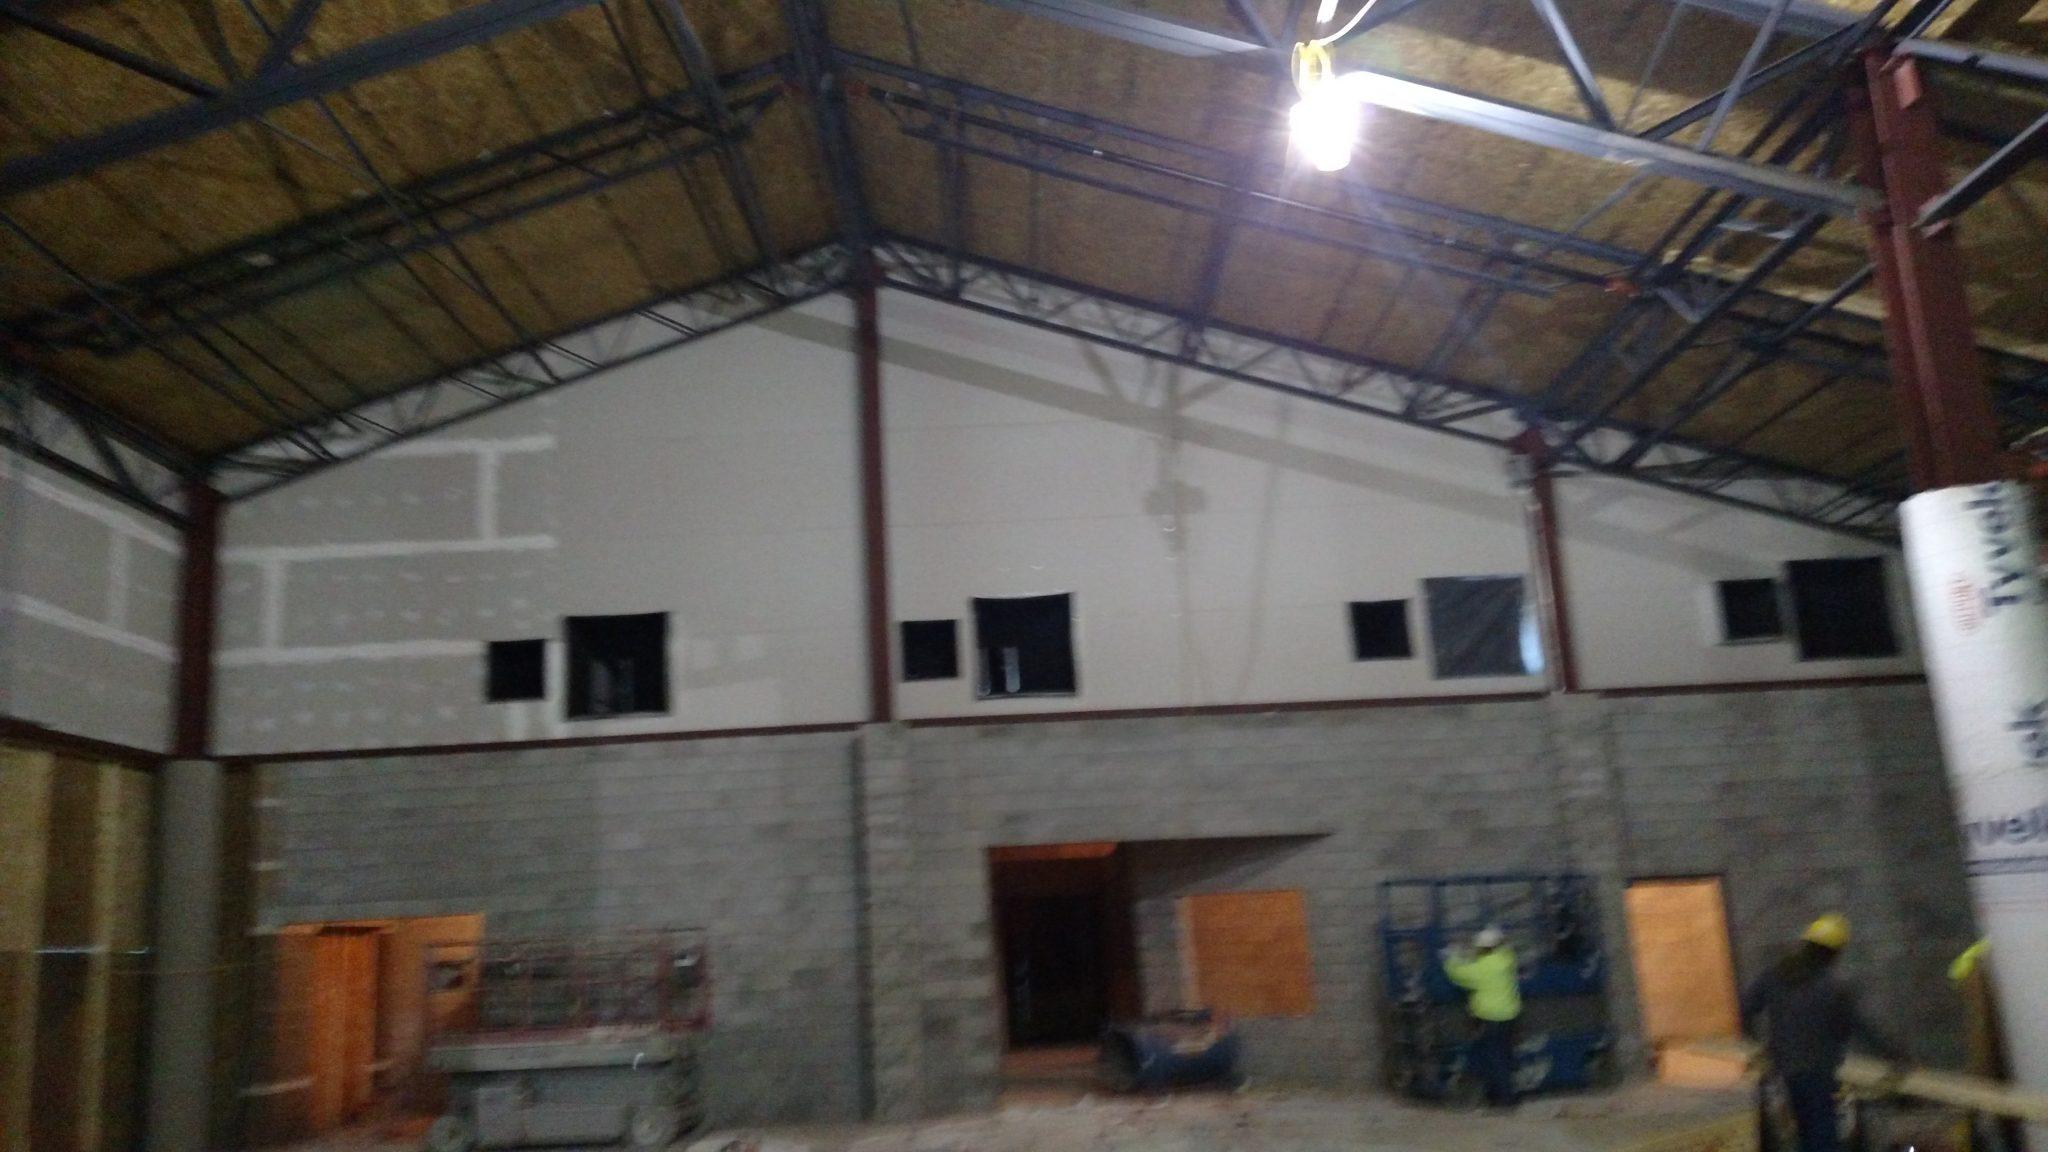 interior walls and floors